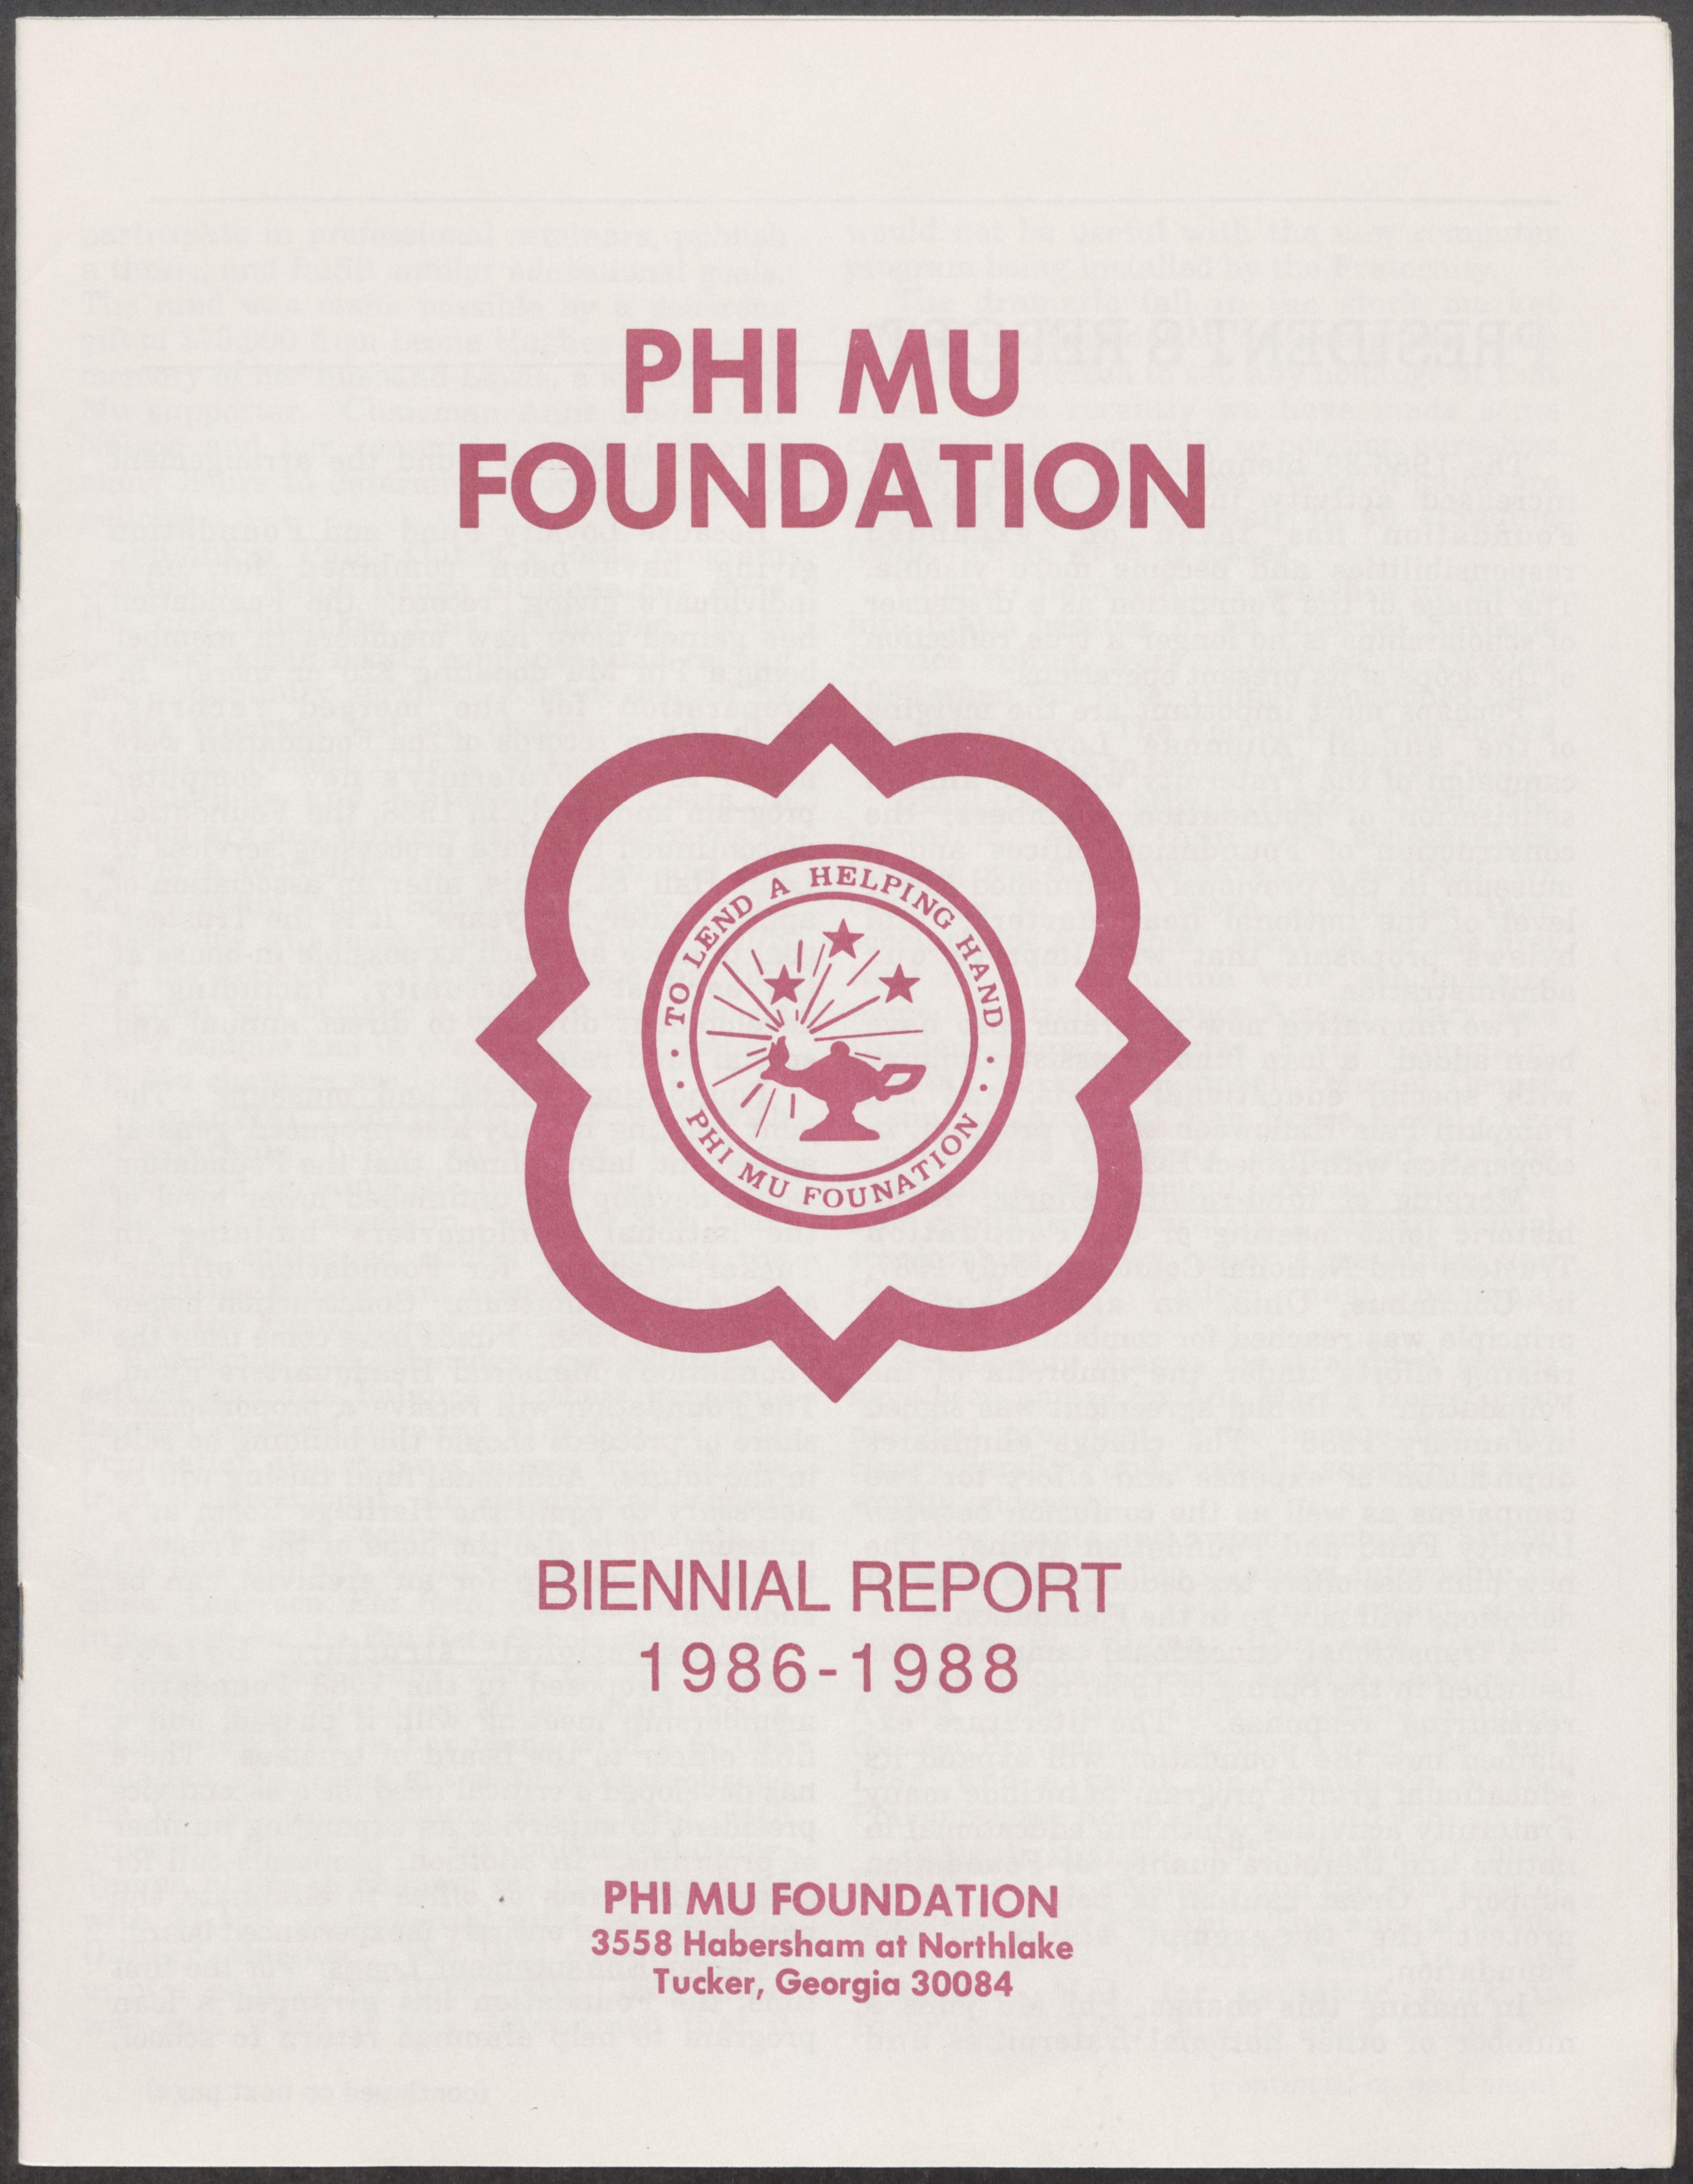 Founding of the Phi Mu Foundation, 1956 Image